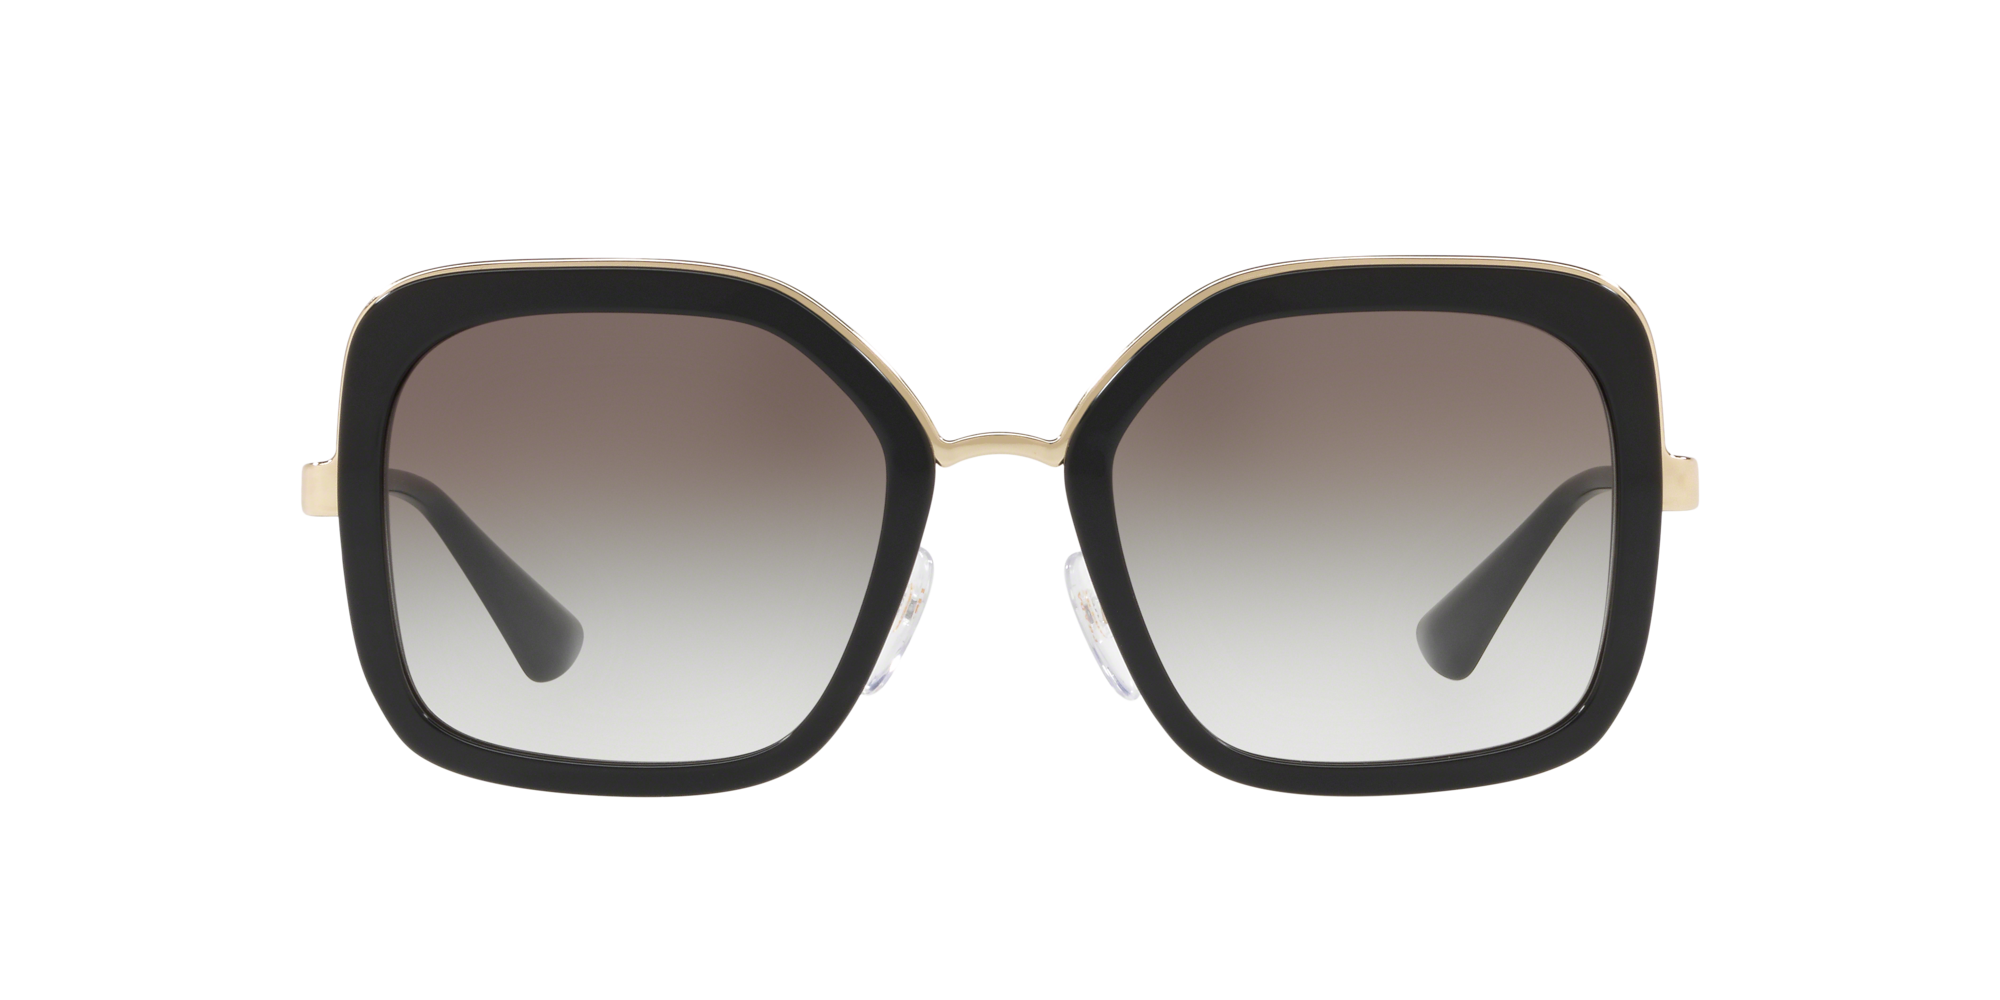 Image for PR 57US 54 CATWALK from LensCrafters | Glasses, Prescription Glasses Online, Eyewear